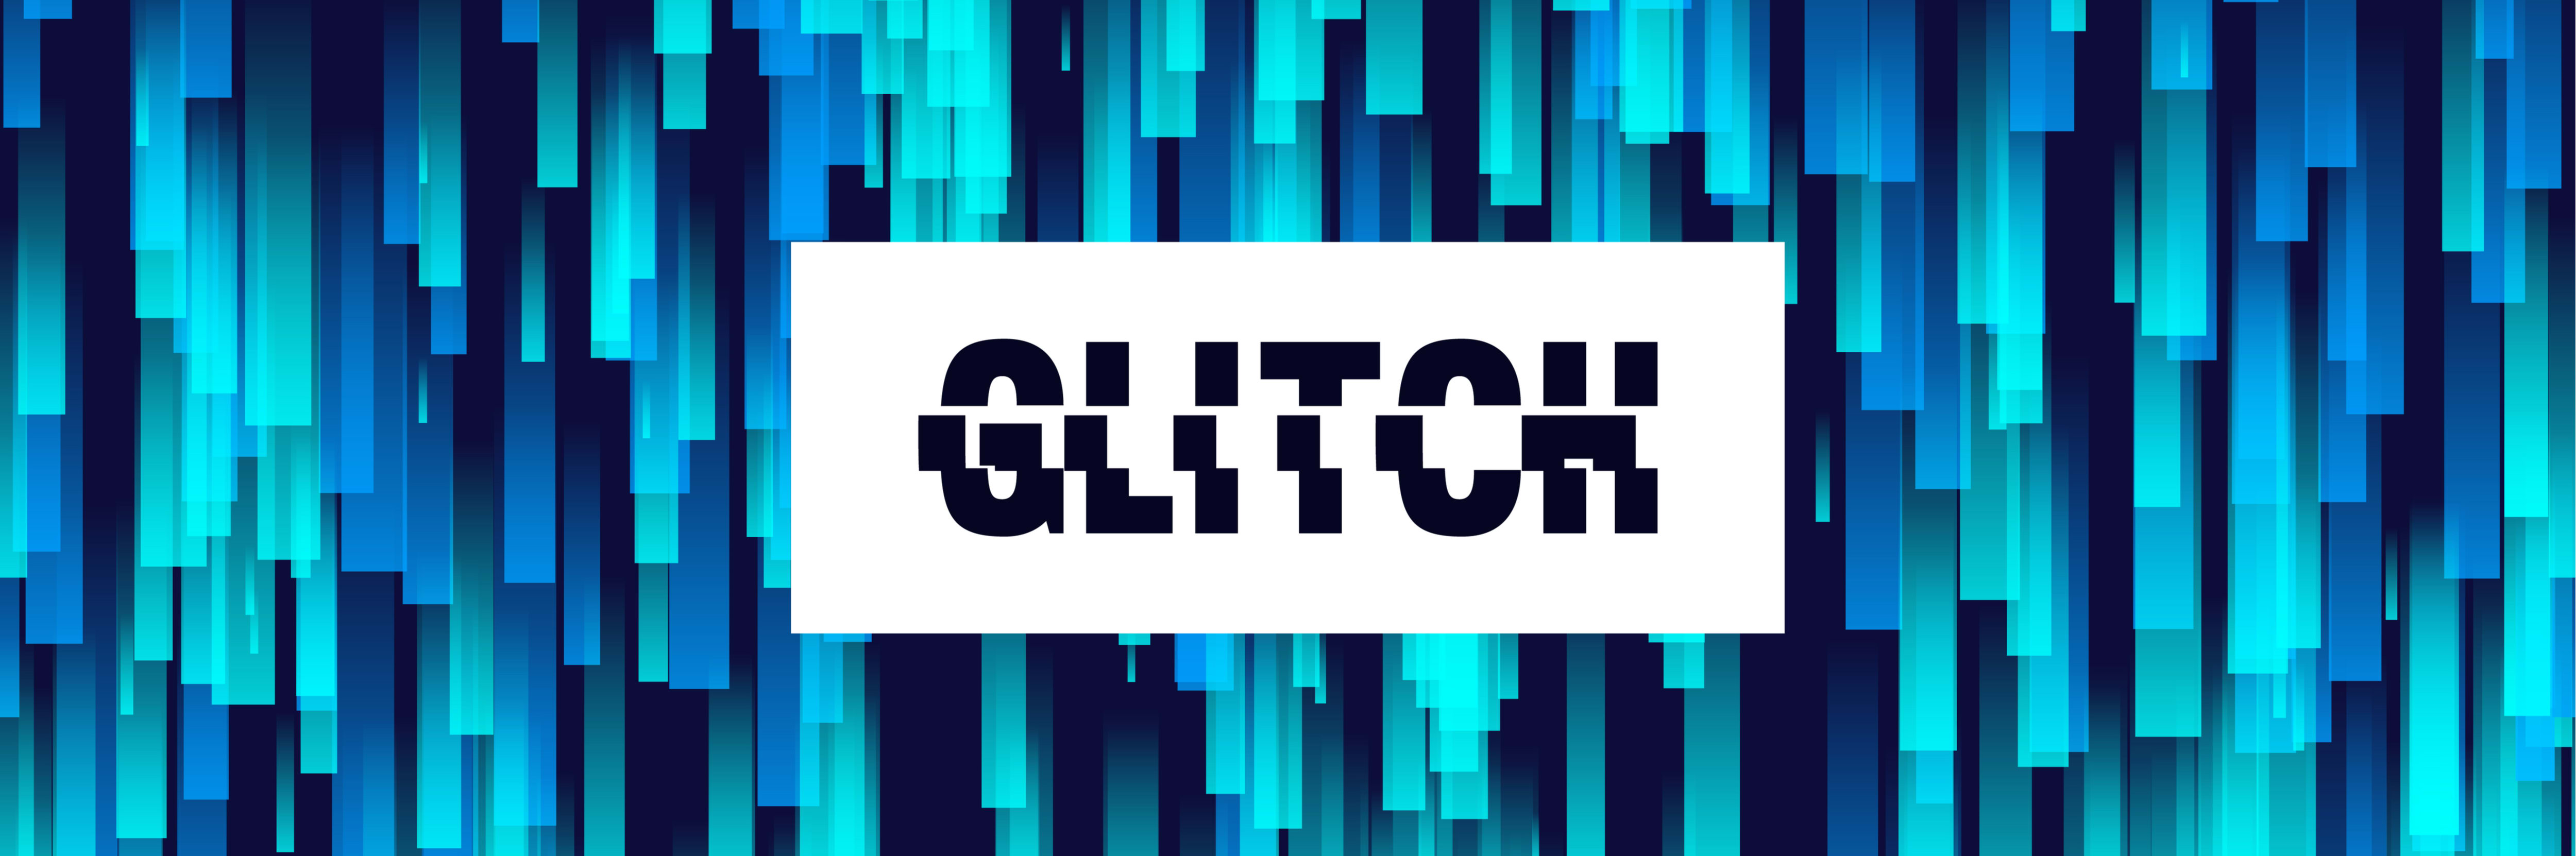 Glitch List - main image